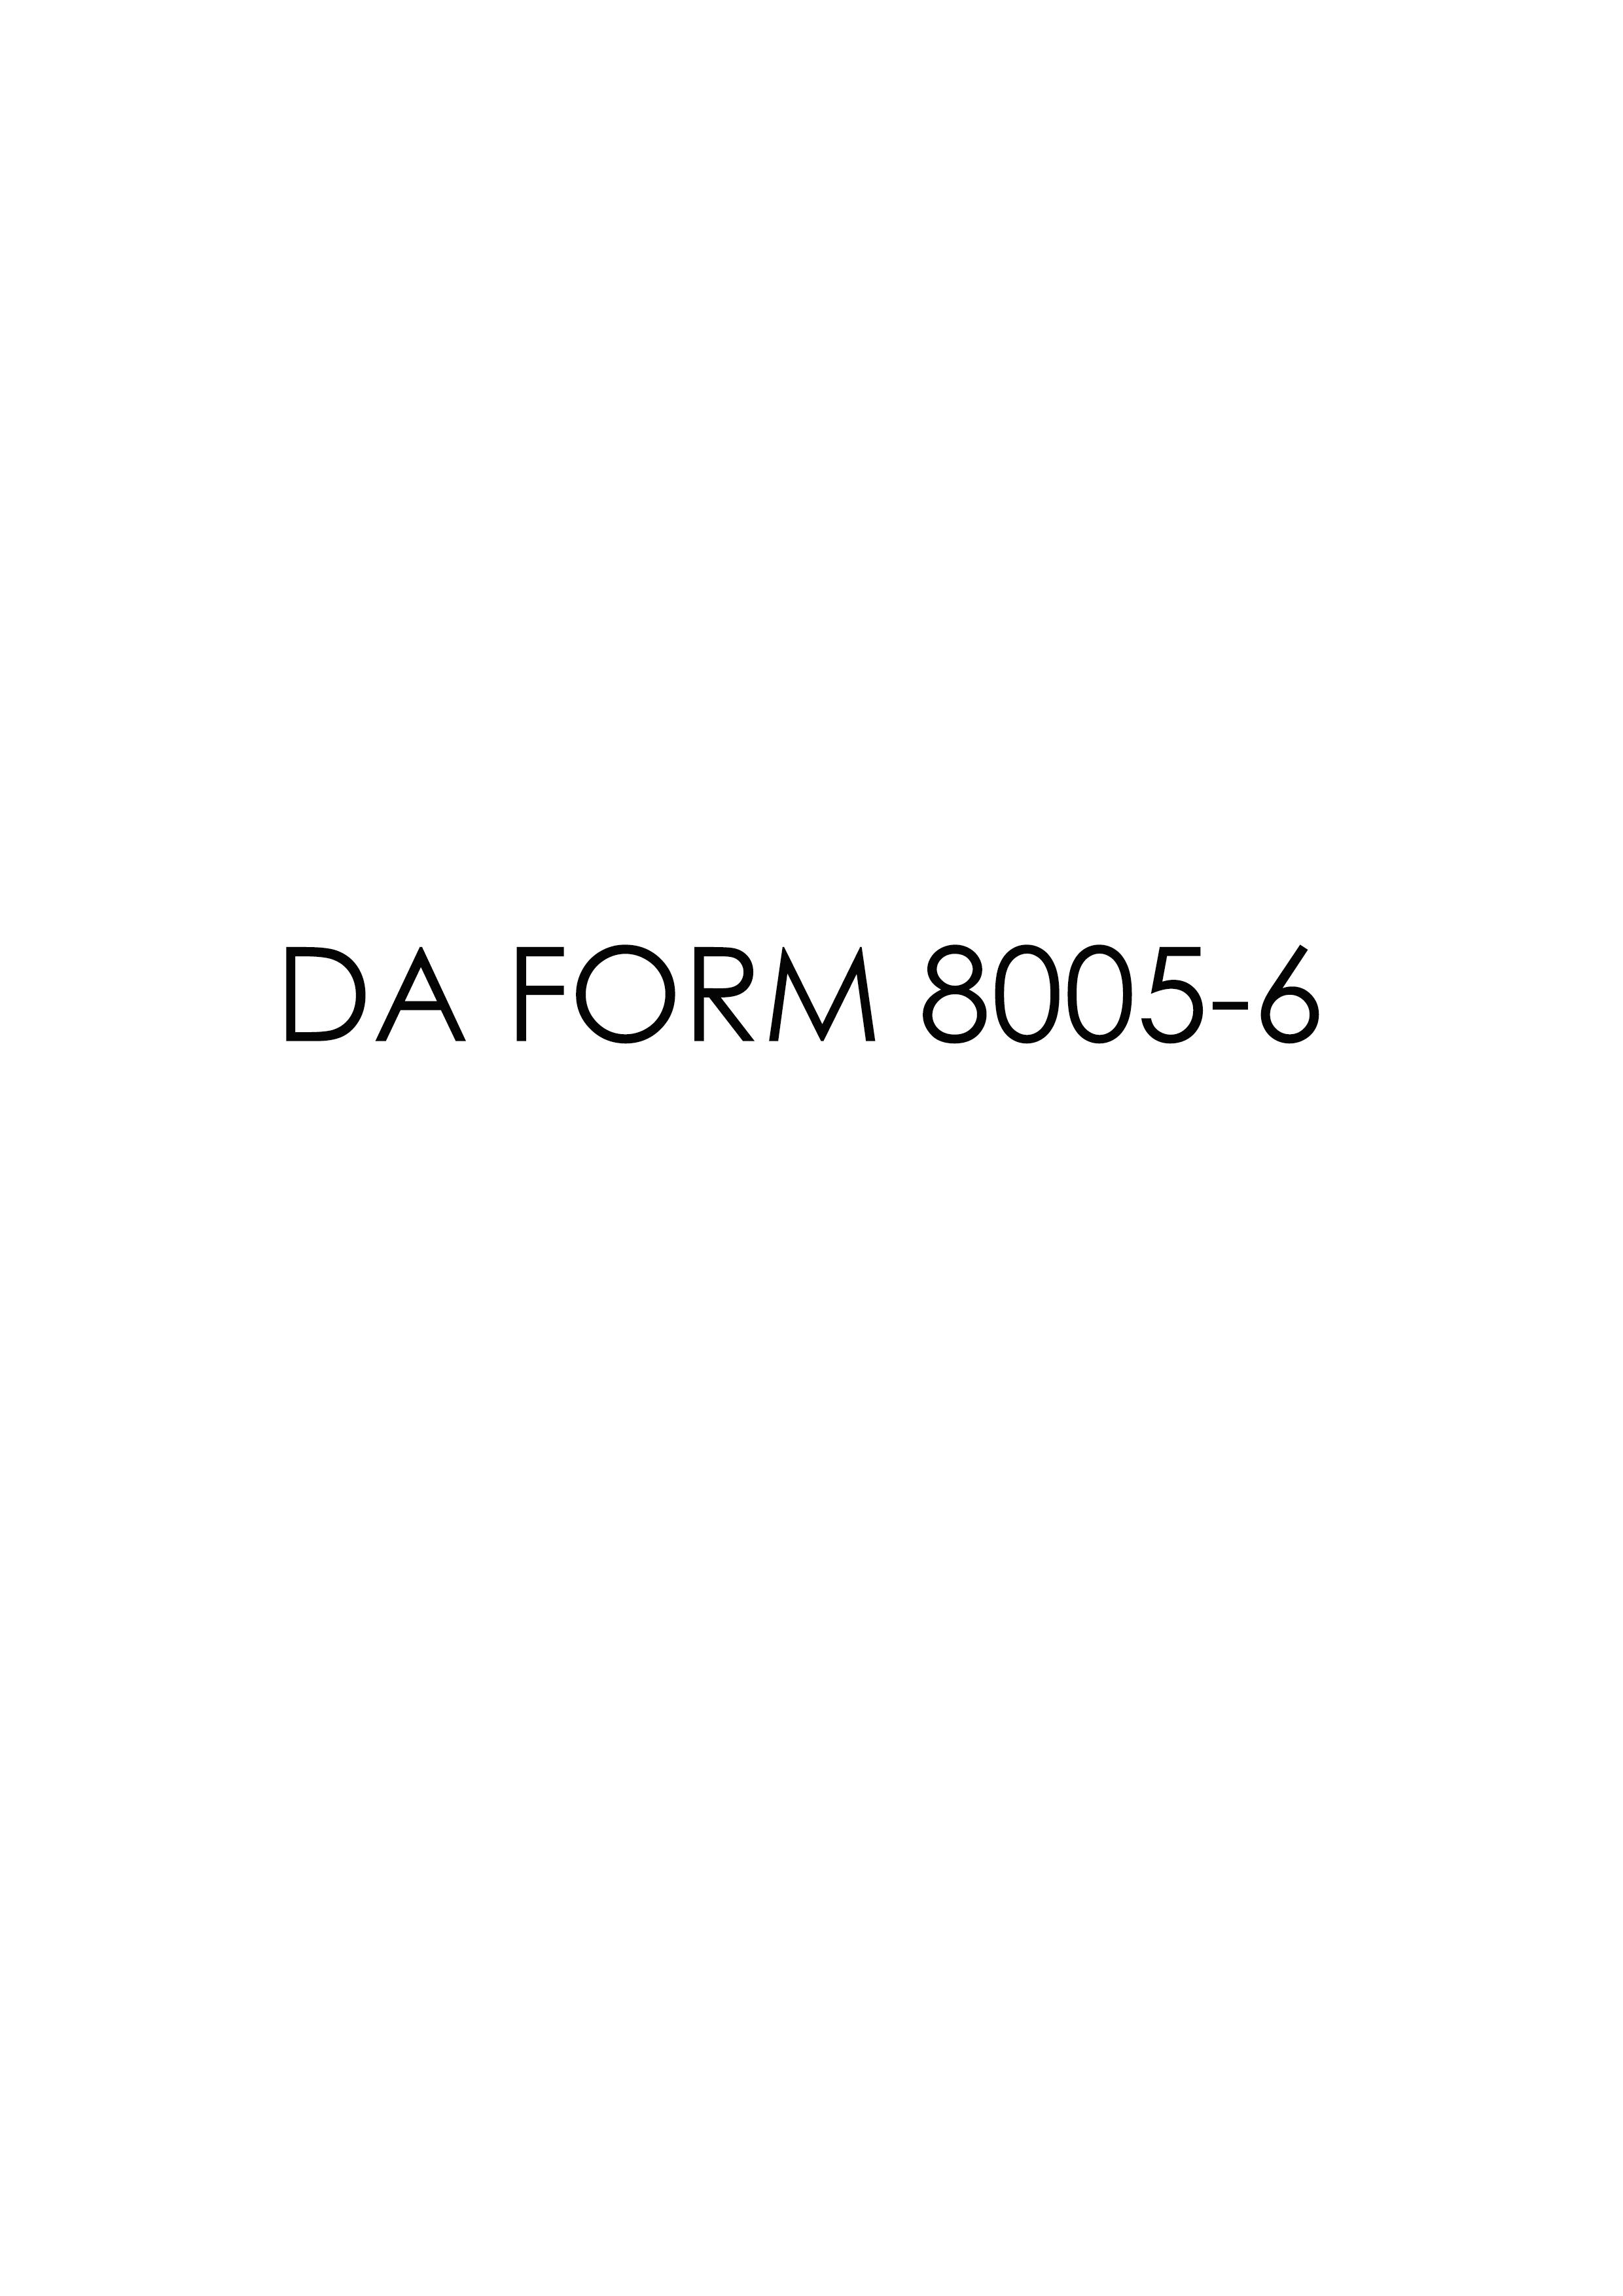 Download da Form 8005-6 Free